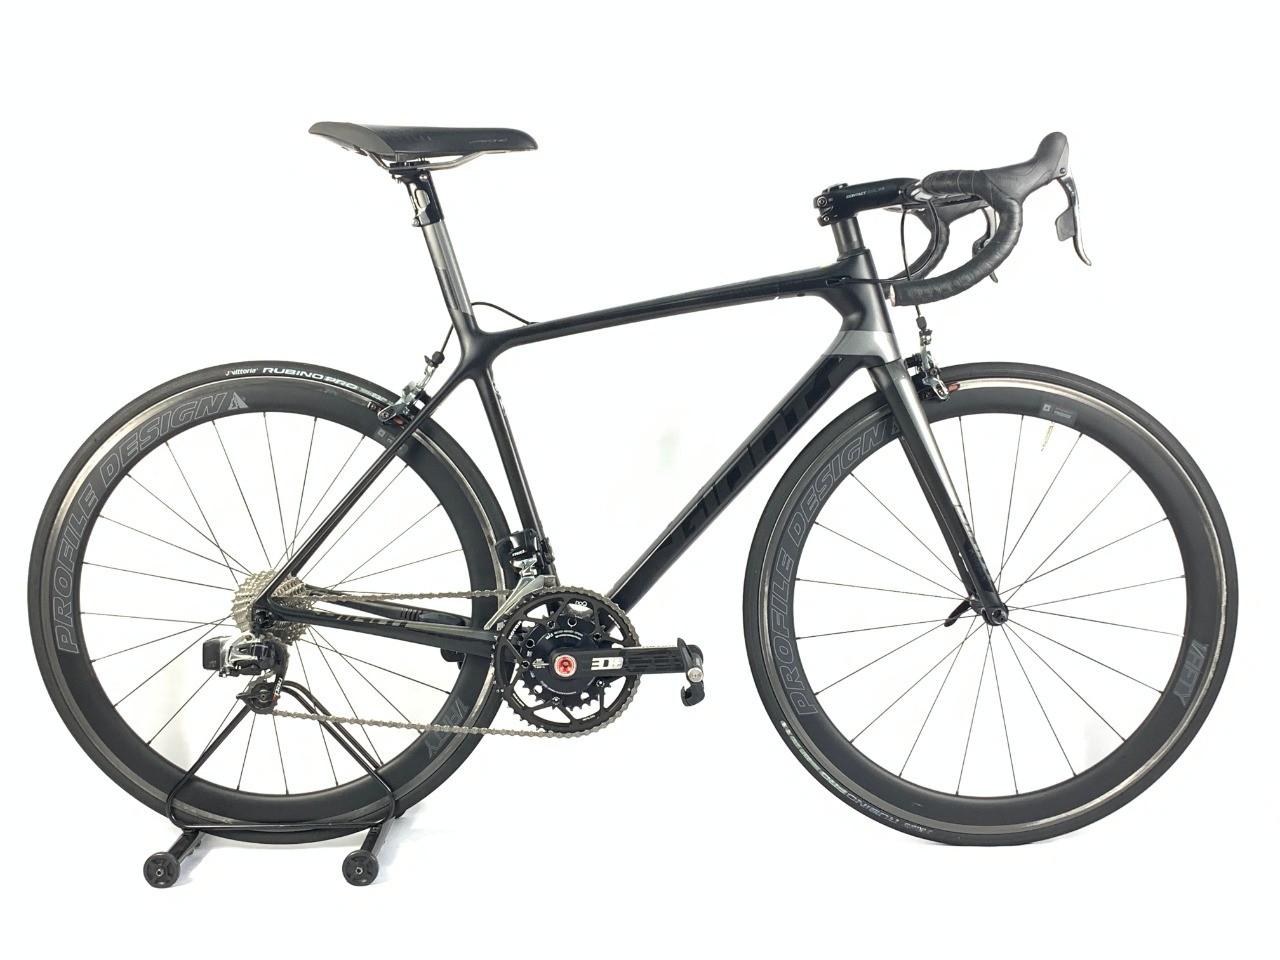 Bicicleta Speed Giant Tcr Advanced Sl Tamanho M